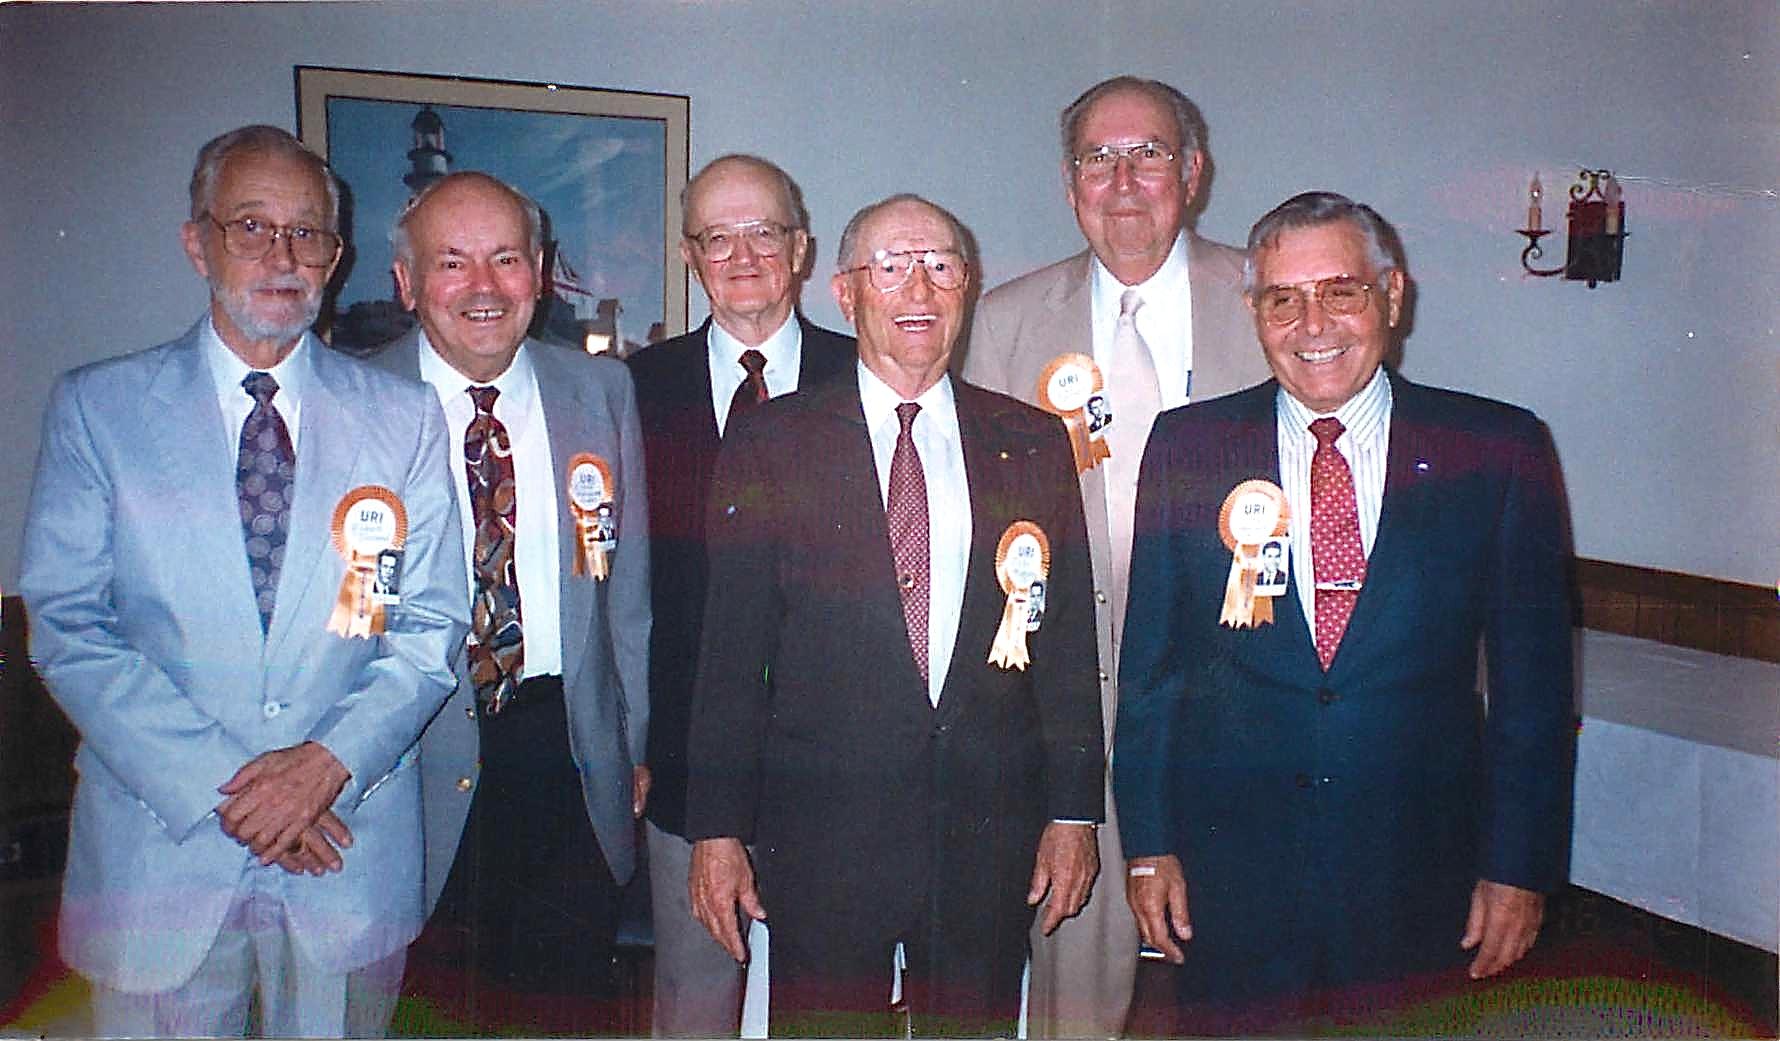 1992 Albert Gudas 50th URI Reunion  Bob Townend, Albert Gudas, Bob Gammons, John Mahoney, Earl Sparks, Hike Hedison